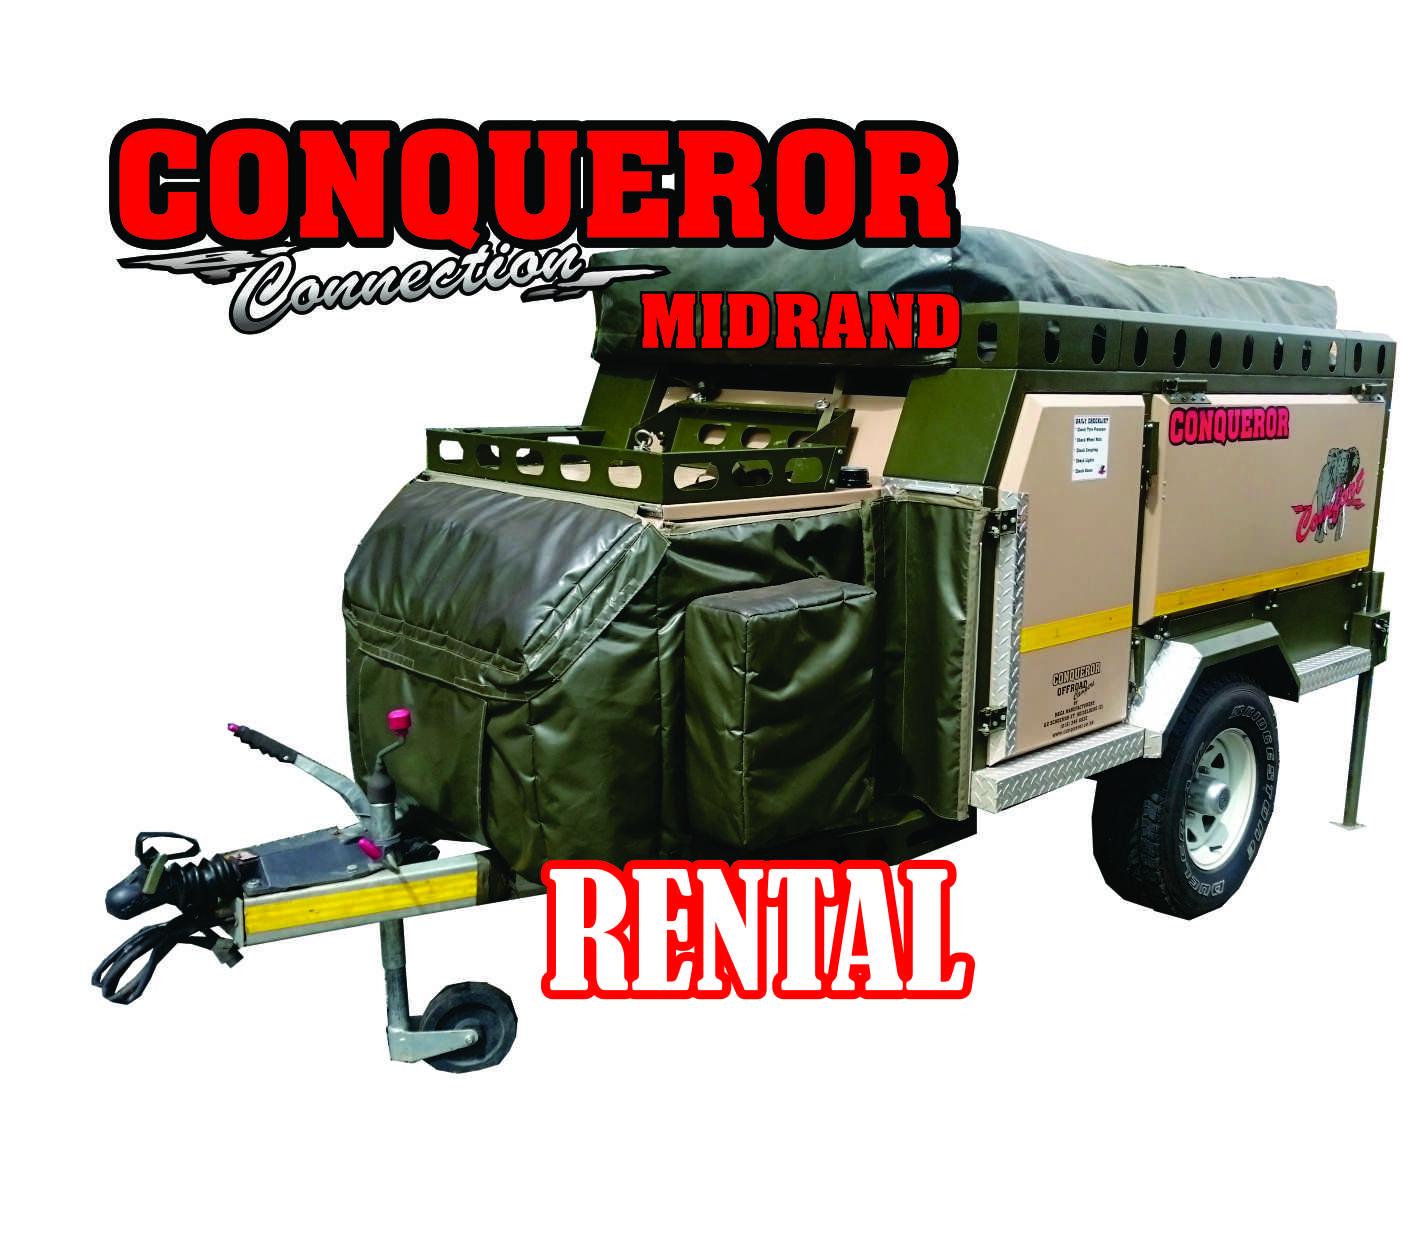 Conqueror Comfort Rental